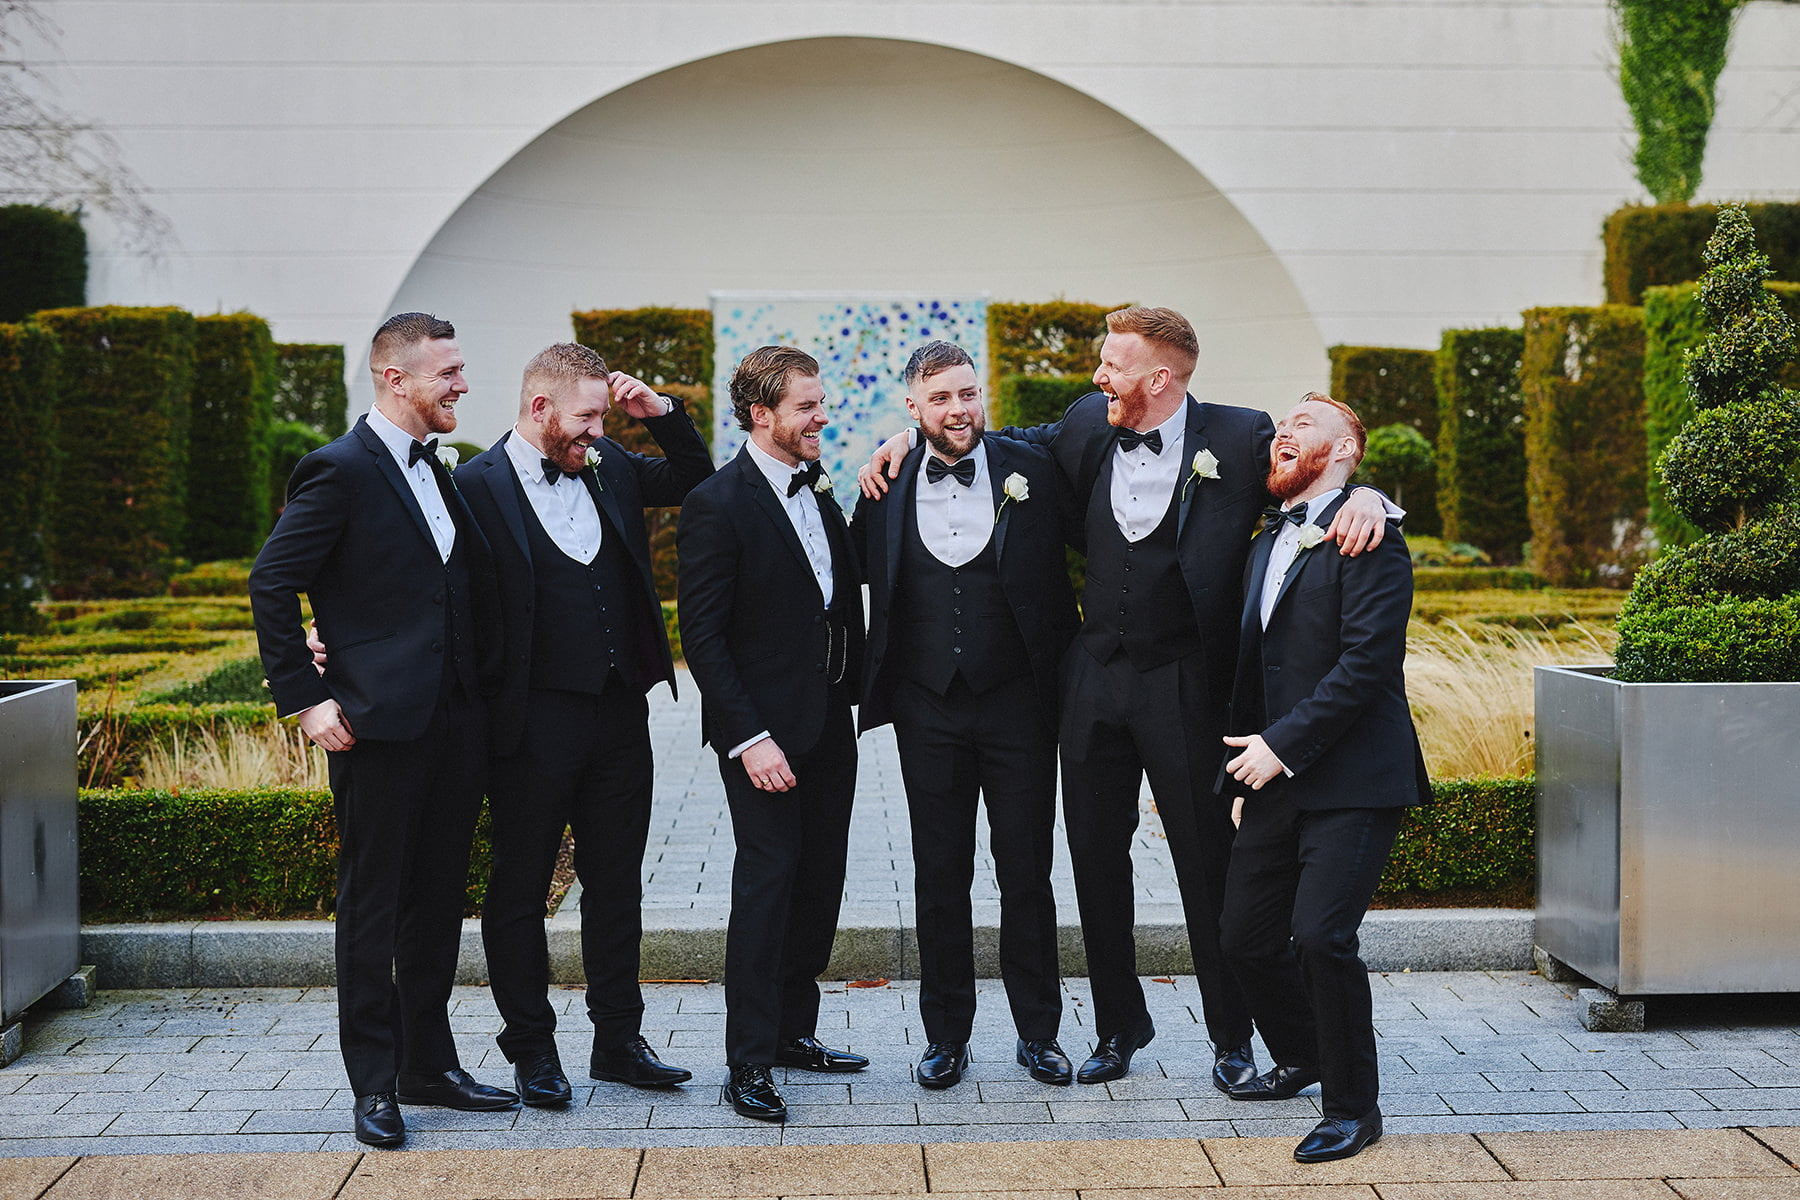 POWERSCOURT HOTEL RESORT INTIMATE WEDDING 69